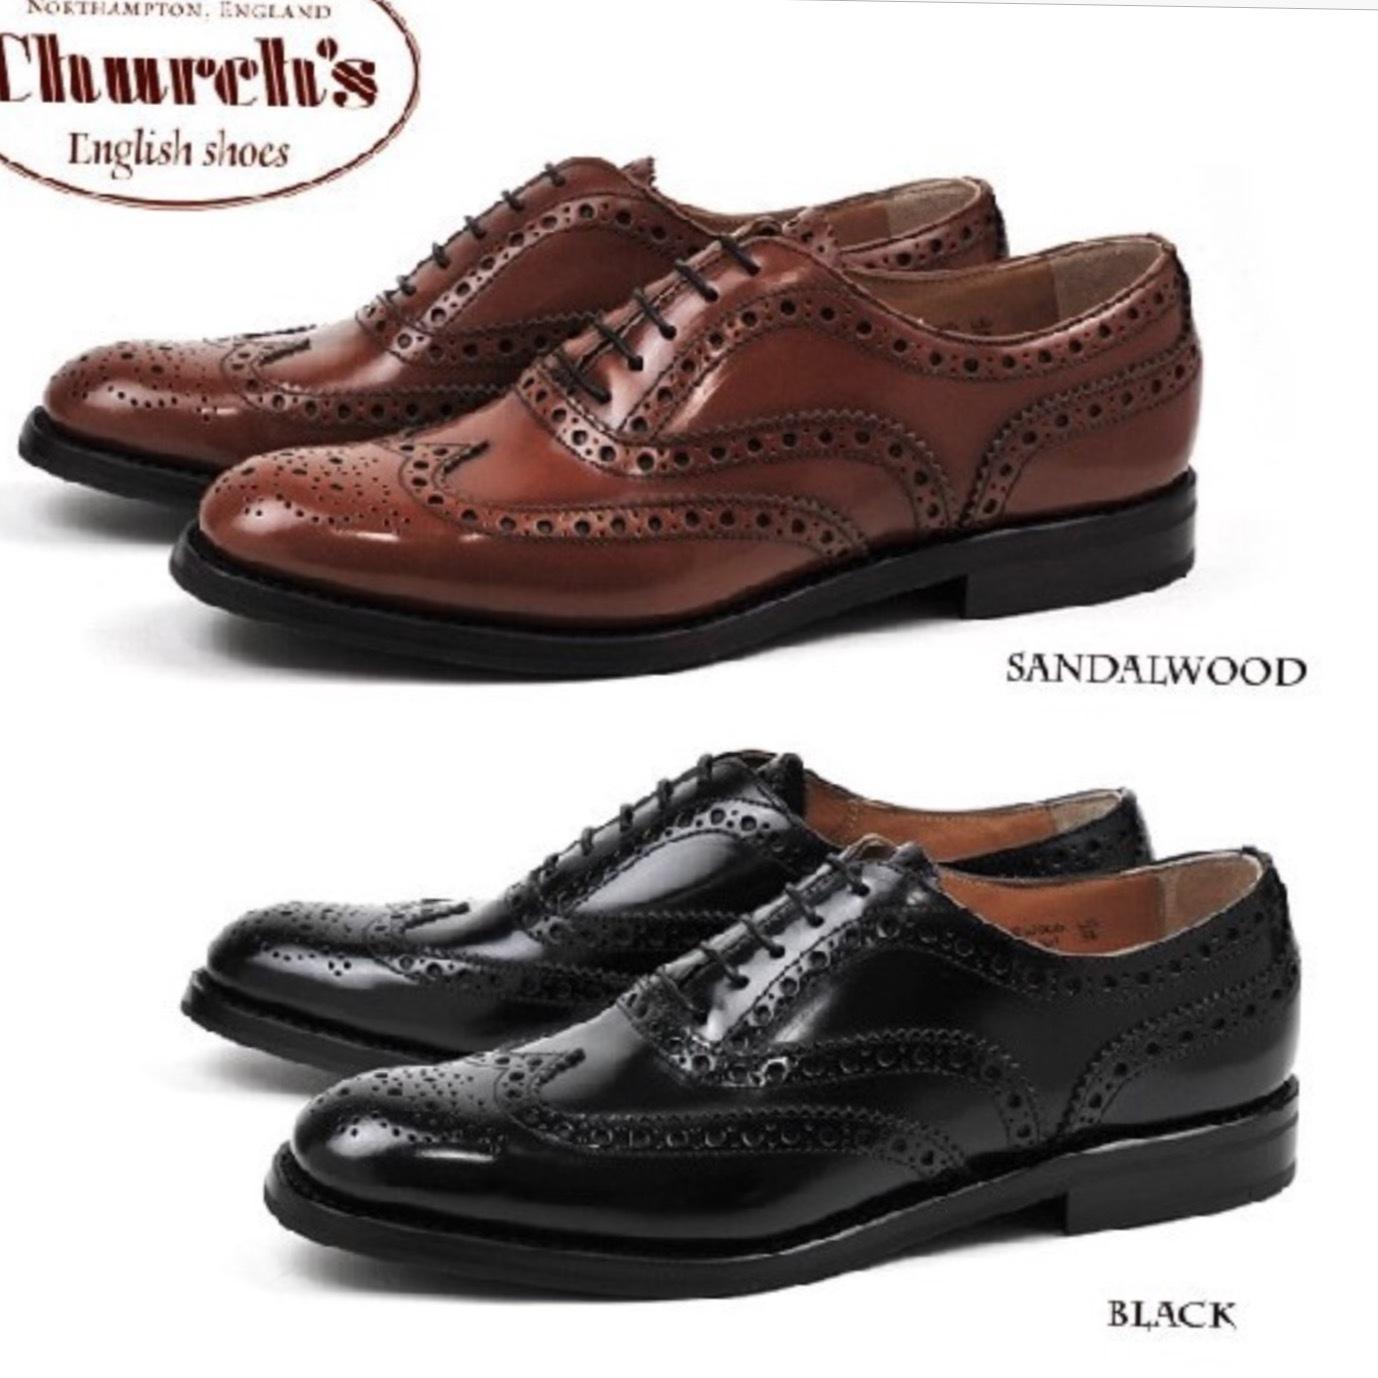 madameHの靴の変遷…紐靴とローファー_b0210699_00442078.jpeg